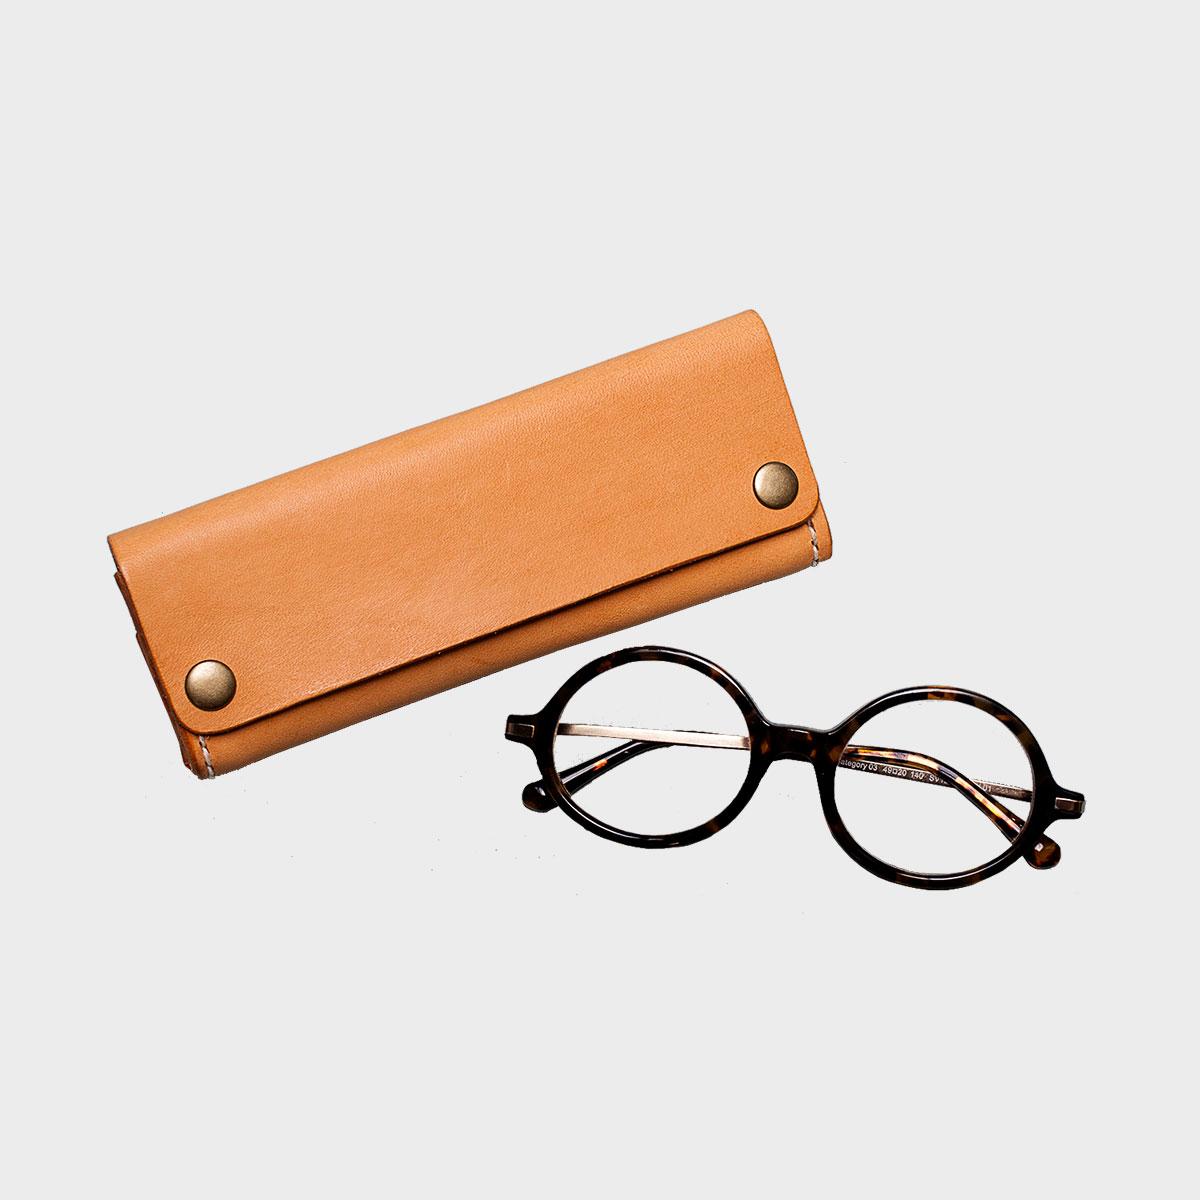 三角眼鏡盒 Triangle Glasses Case    NT$ 1,280  HDB3005